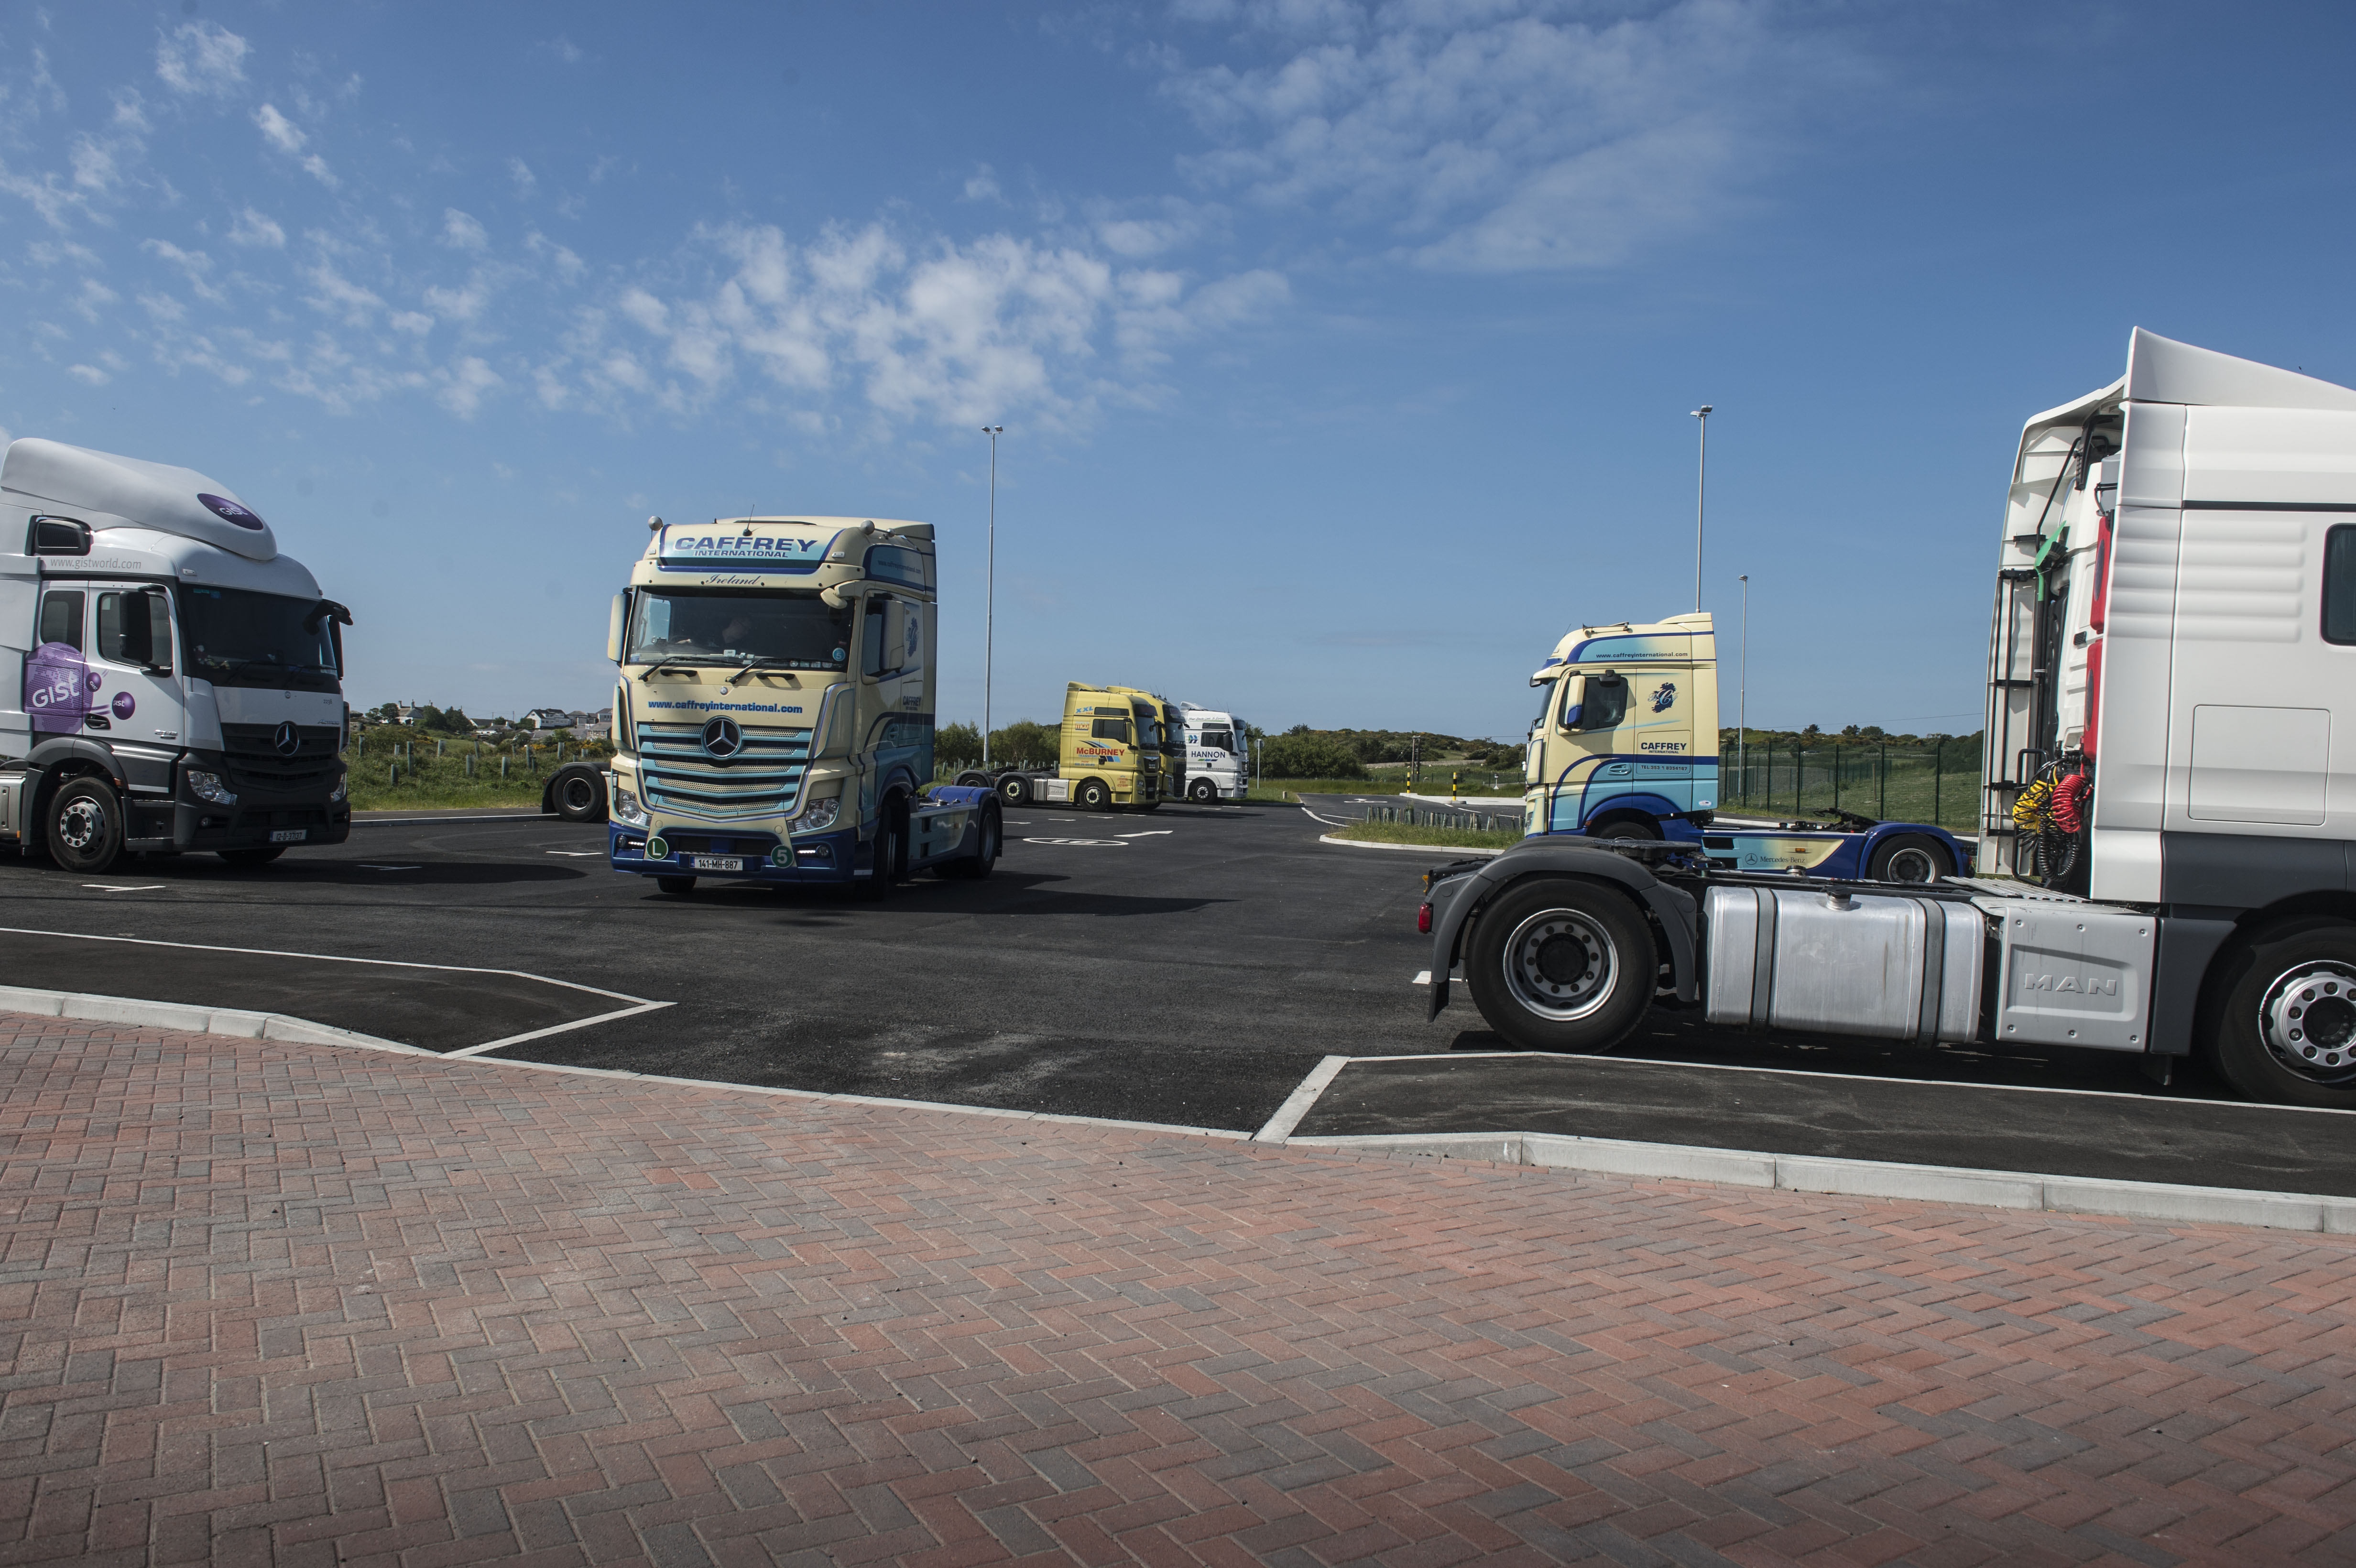 holyhead-truckstop_ndf0873